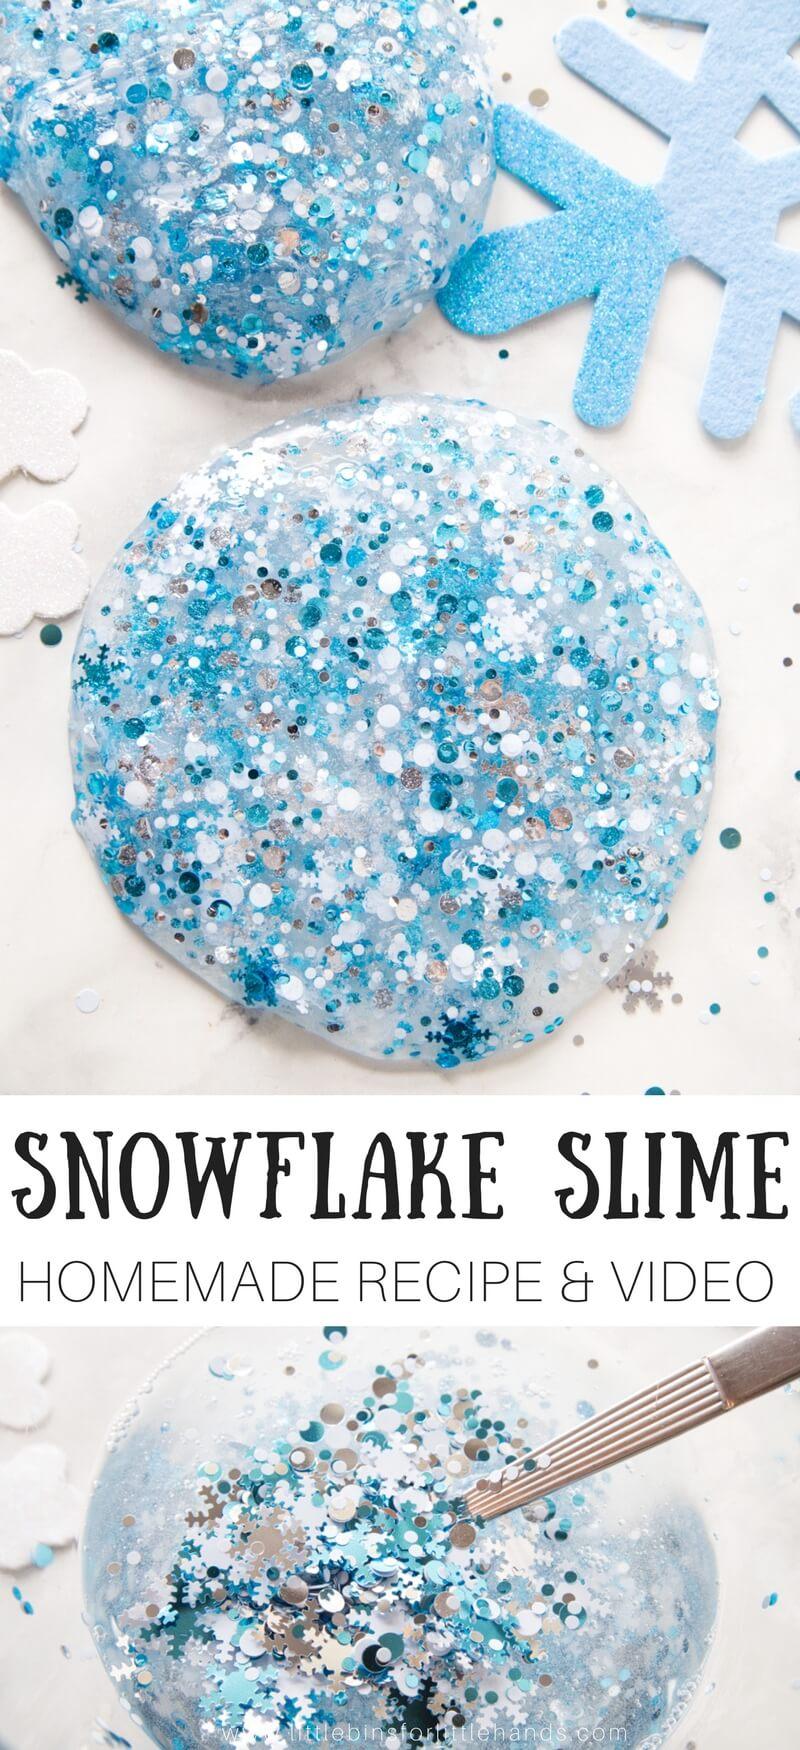 Make Homemade Snowflake Slime Recipe With Video